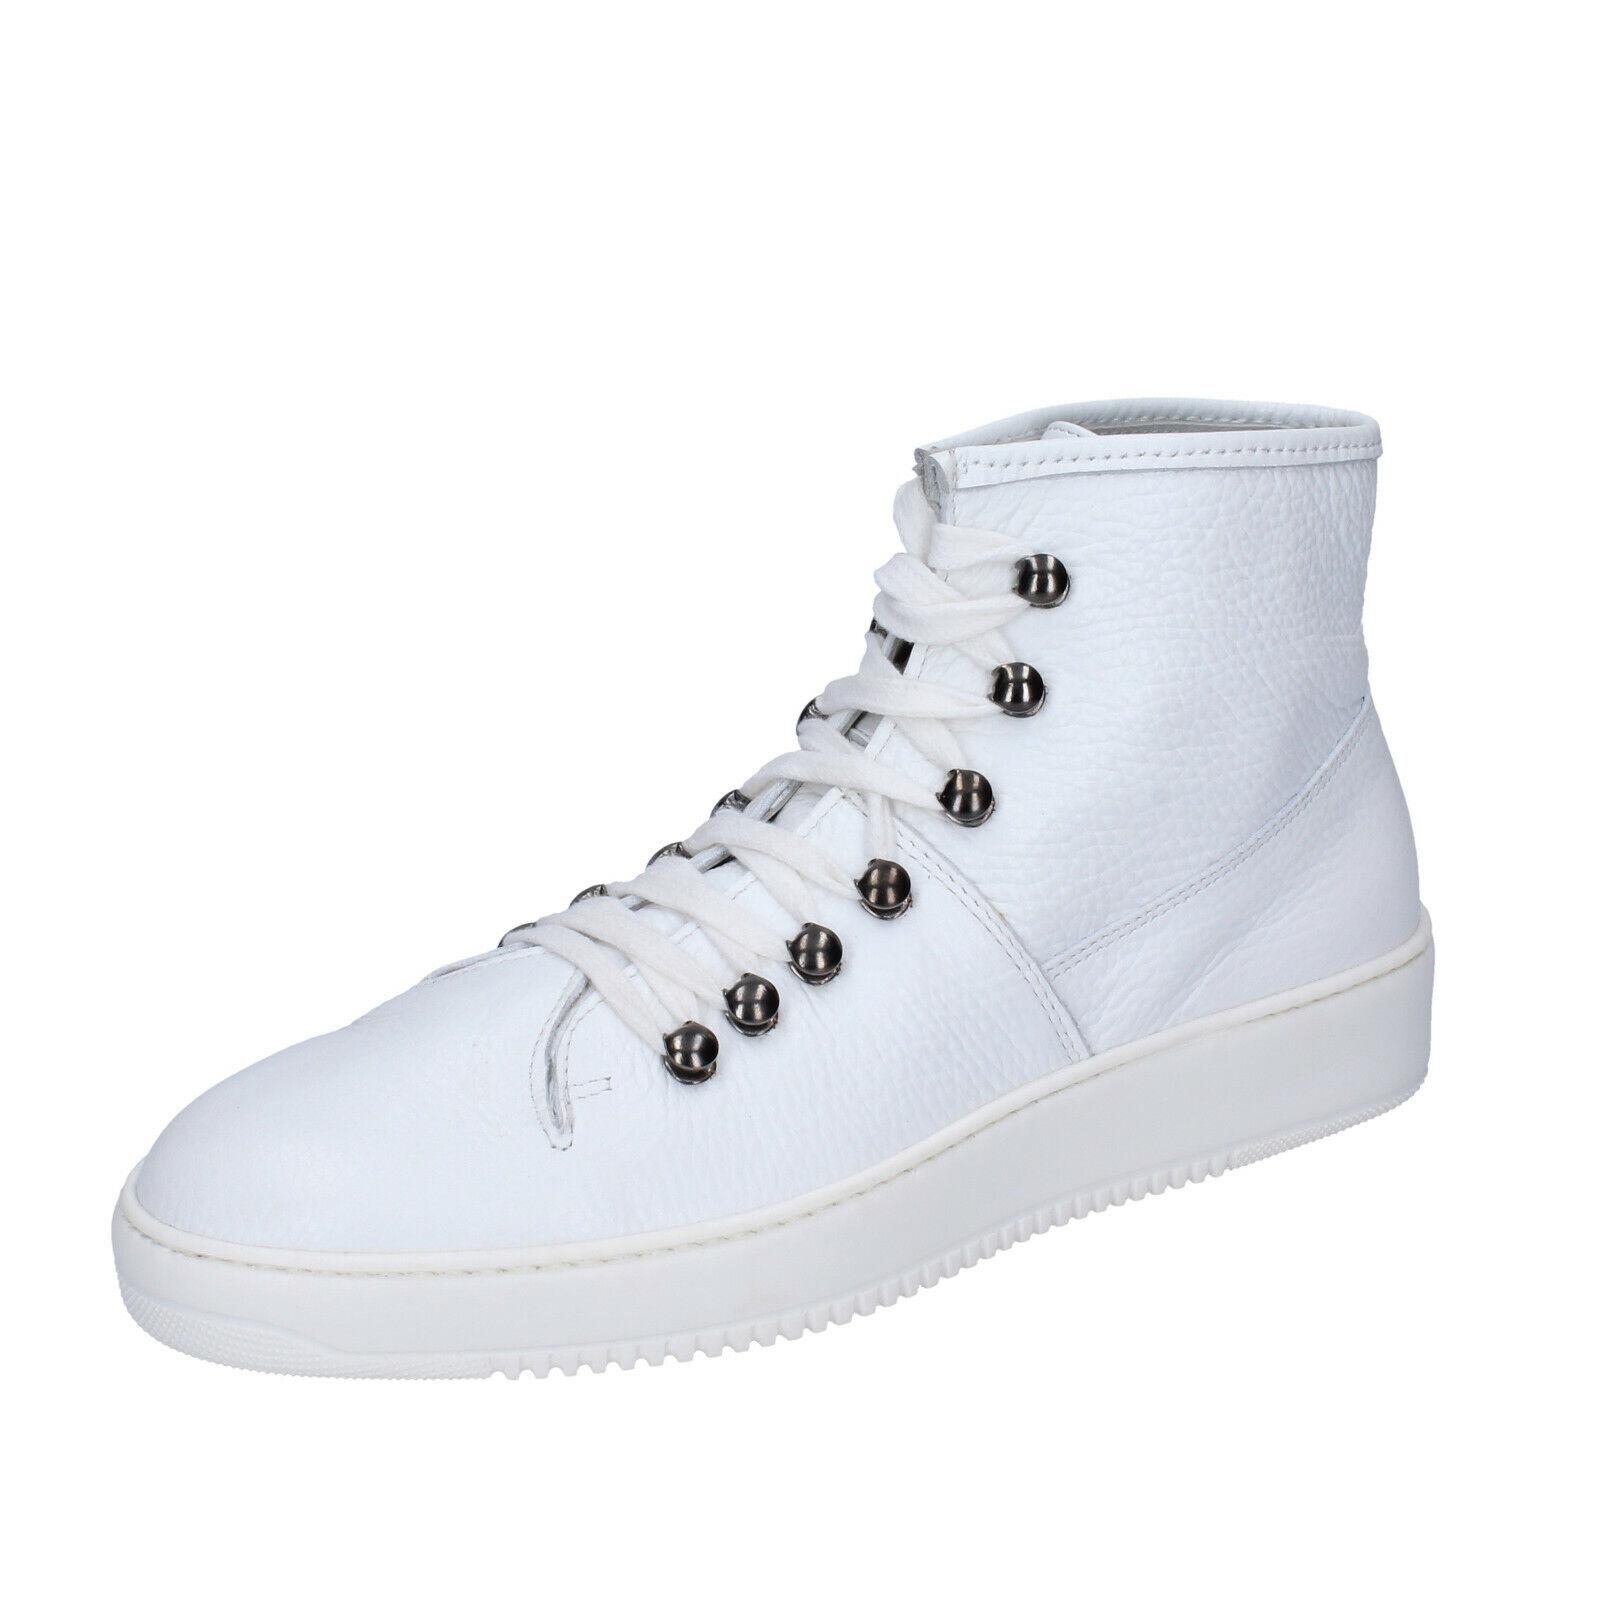 Men's shoes ROBERTO BOTTICELLI 5 (39 EU) sneakers white leather BN810-39